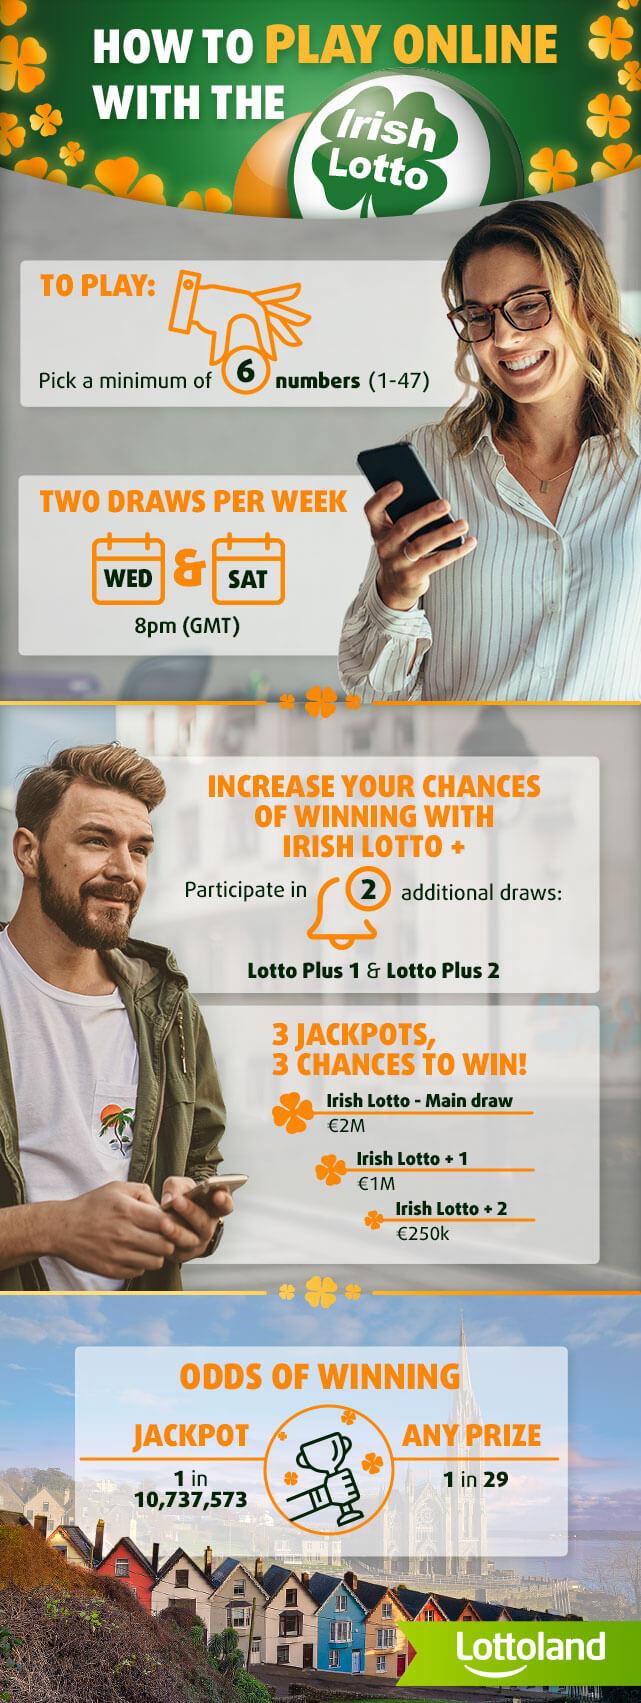 Irish Lotto Information Infographic